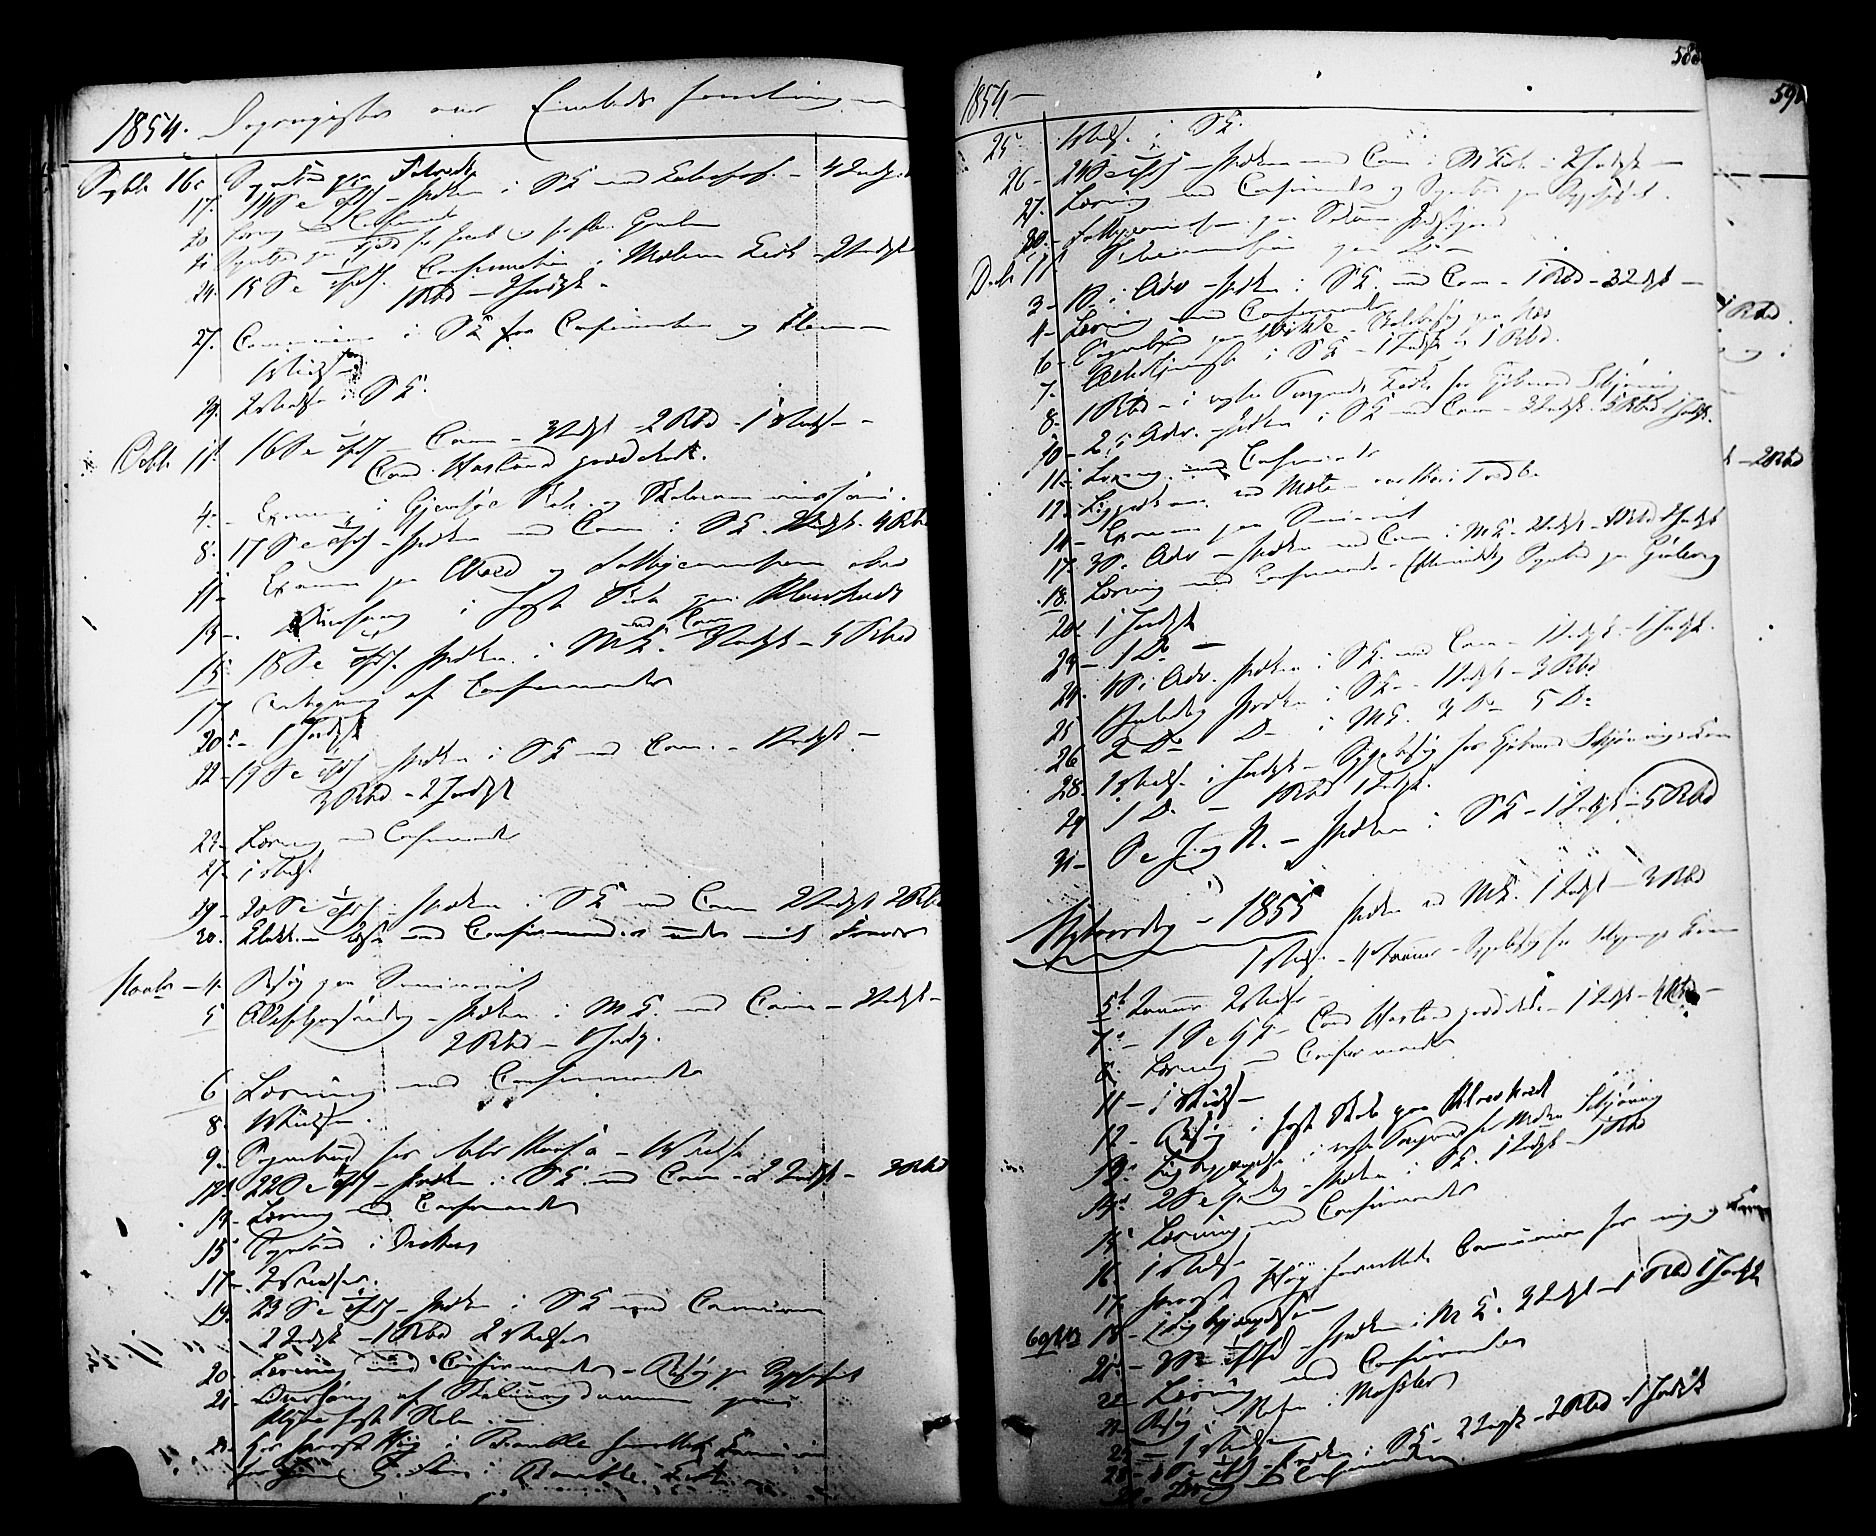 SAKO, Solum kirkebøker, F/Fa/L0006: Ministerialbok nr. I 6, 1844-1855, s. 588